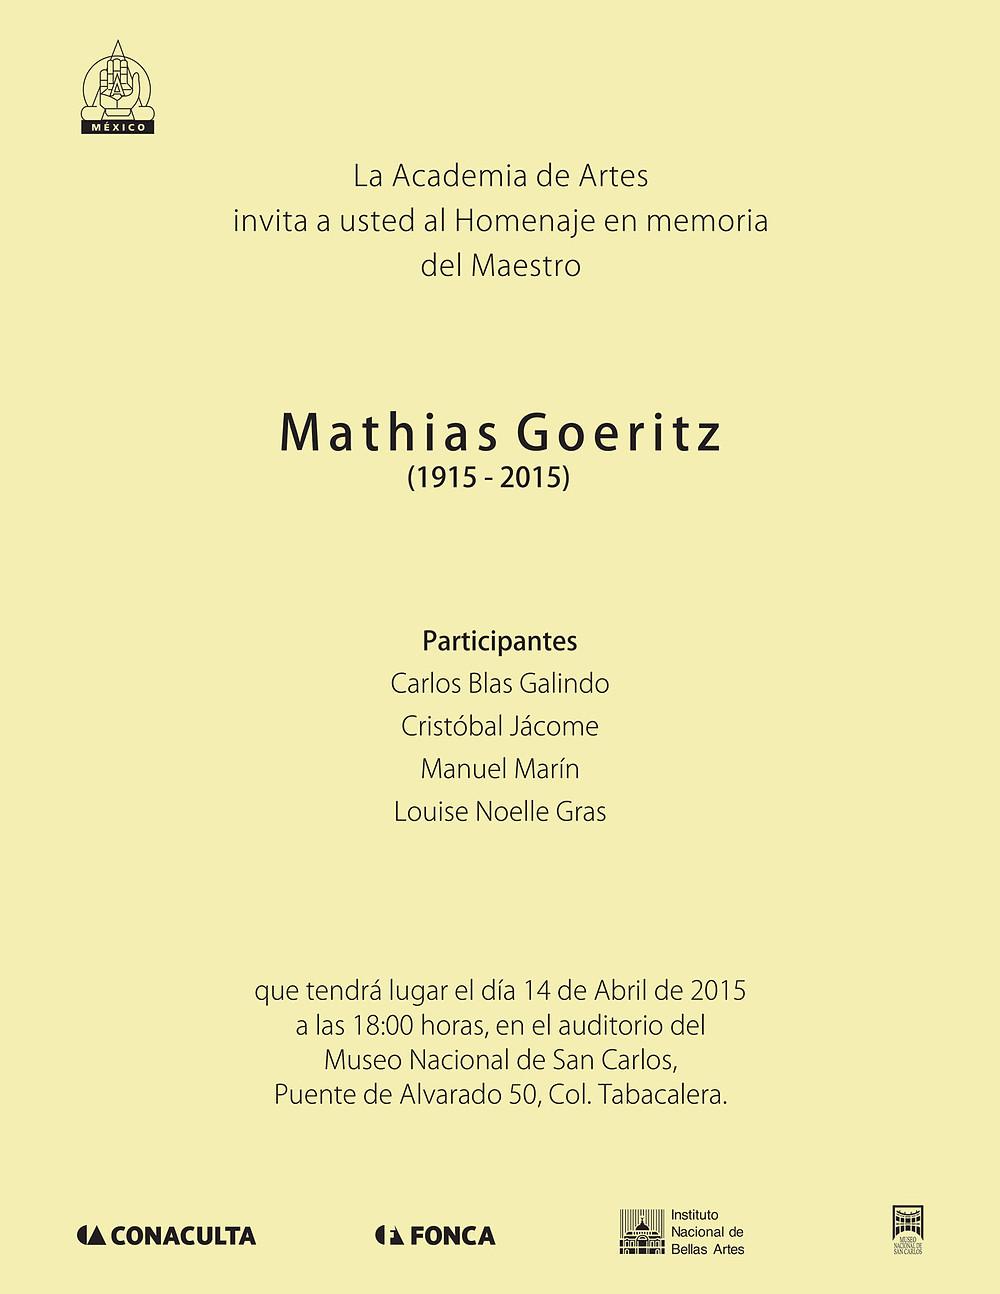 mathias-Goeritz-digital.jpg